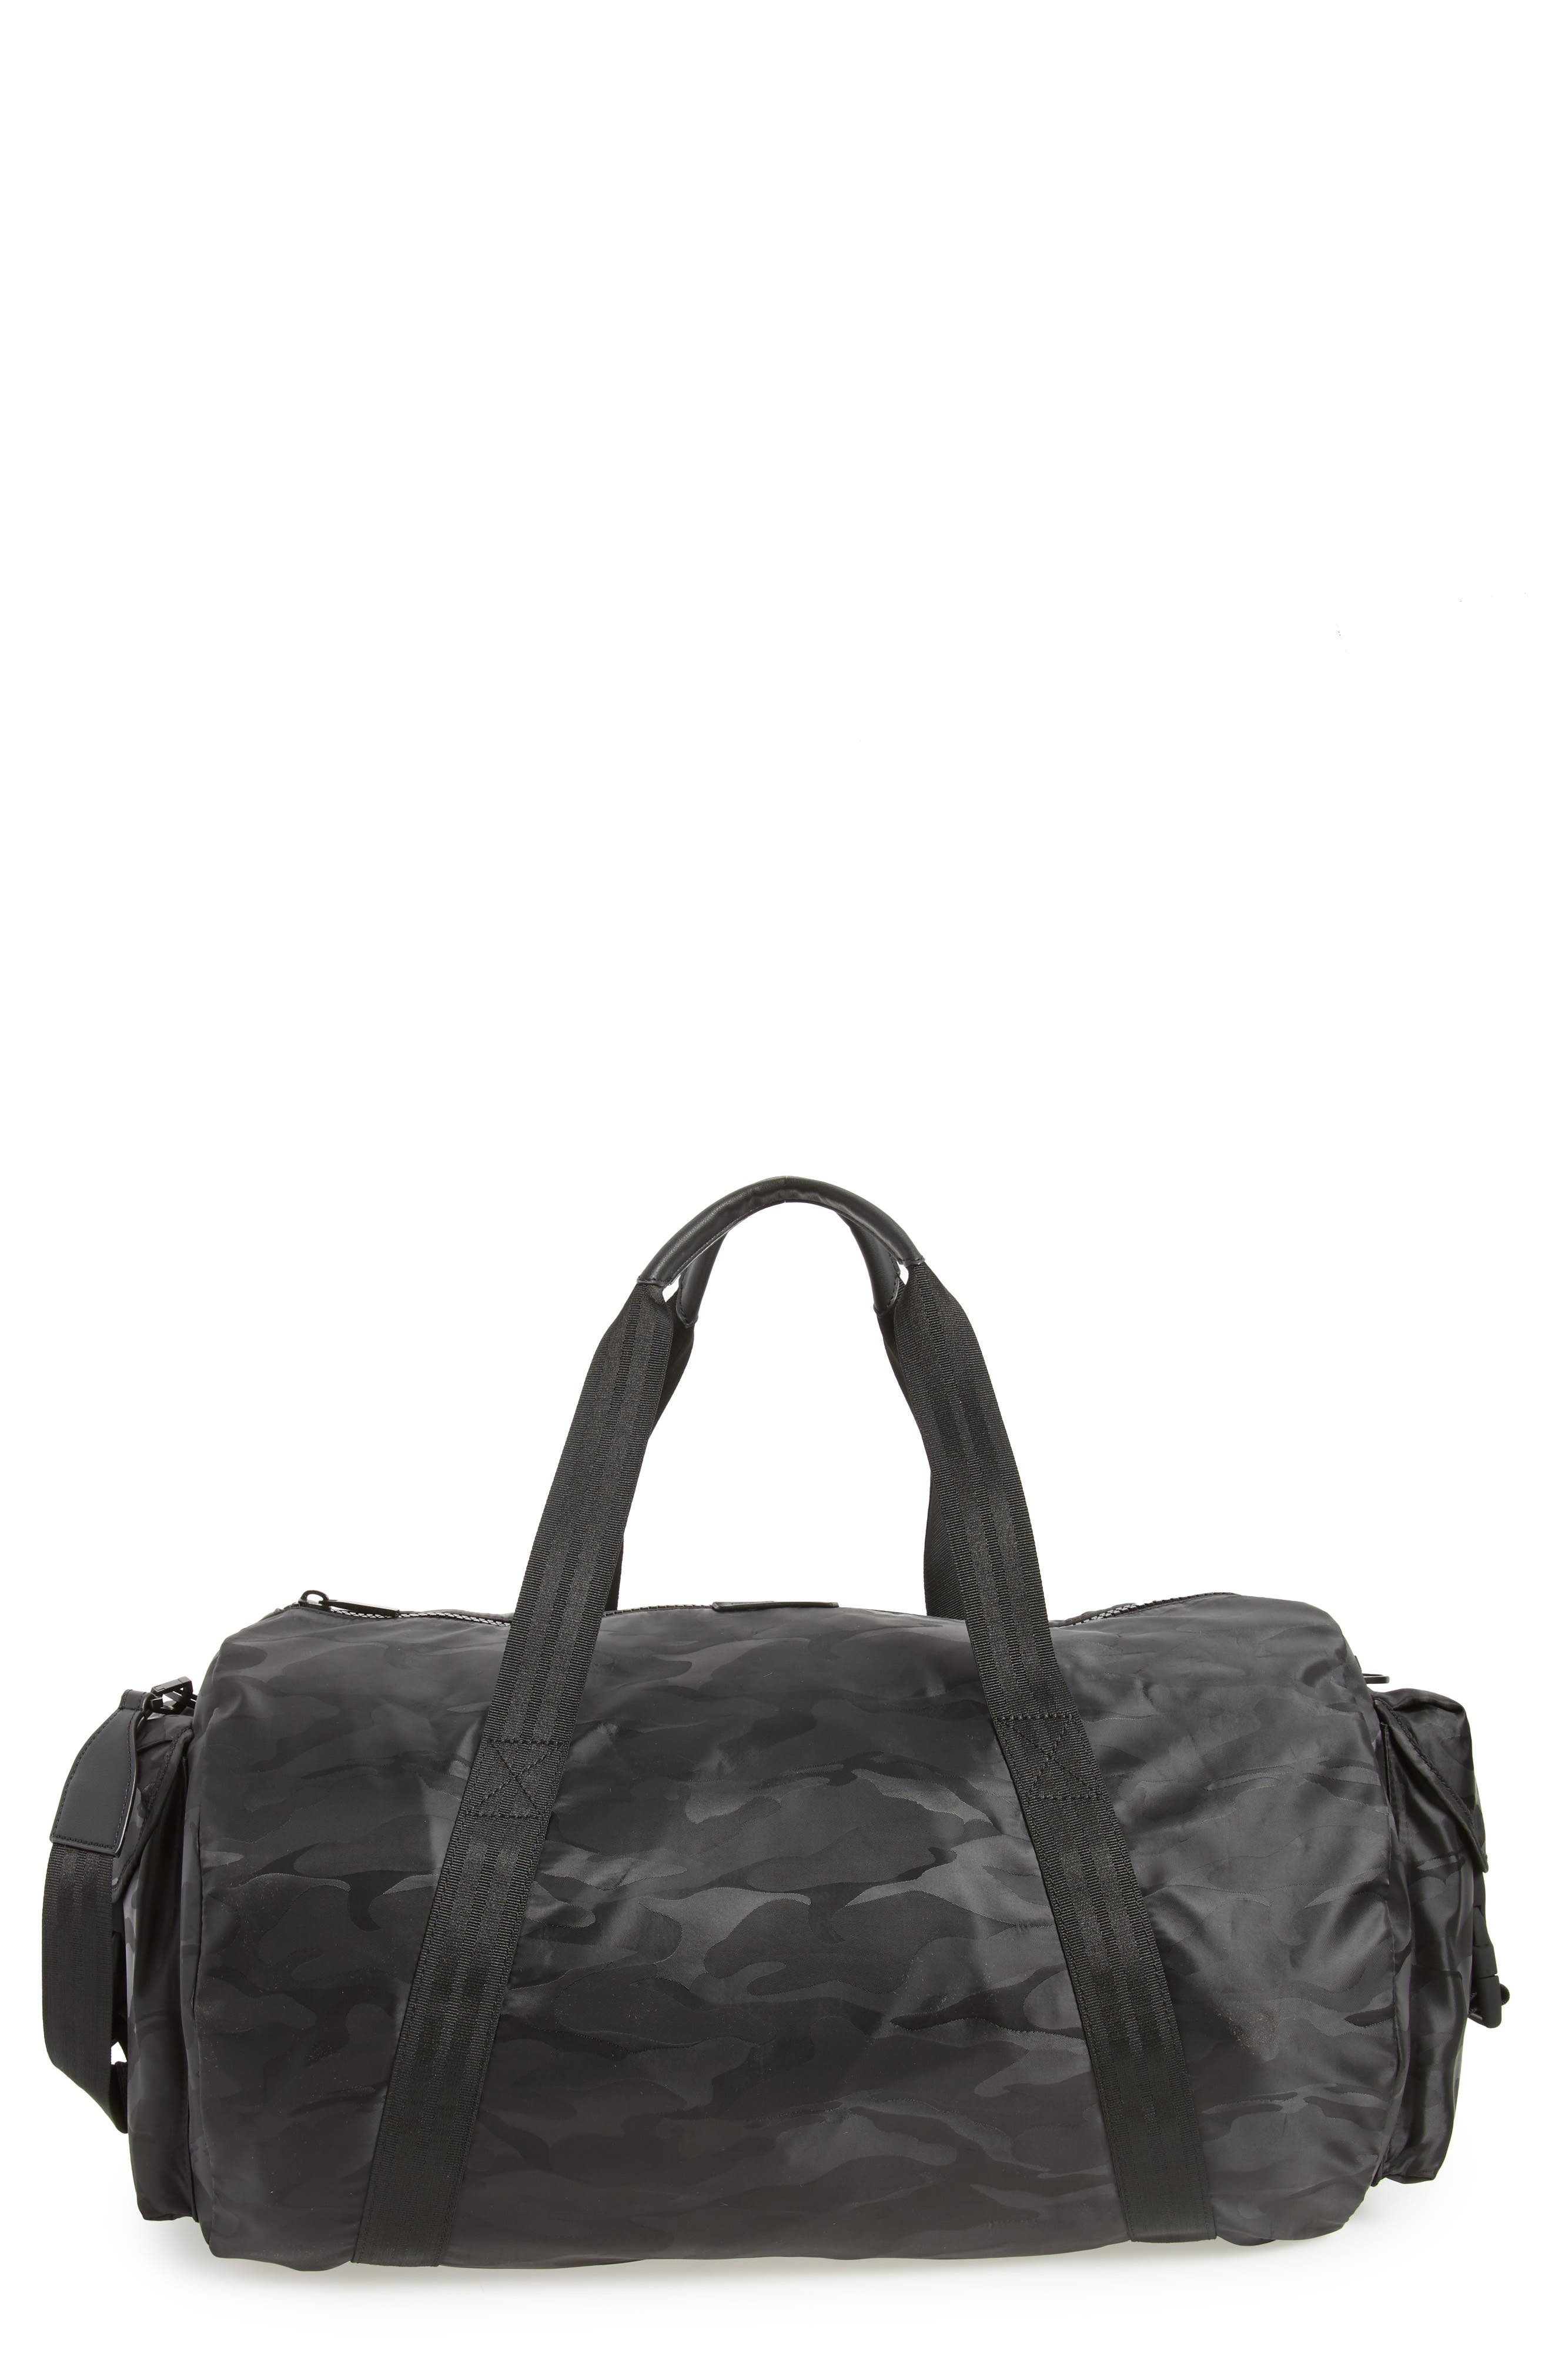 KENDALL + KYLIE Zac Nylon Duffel Bag